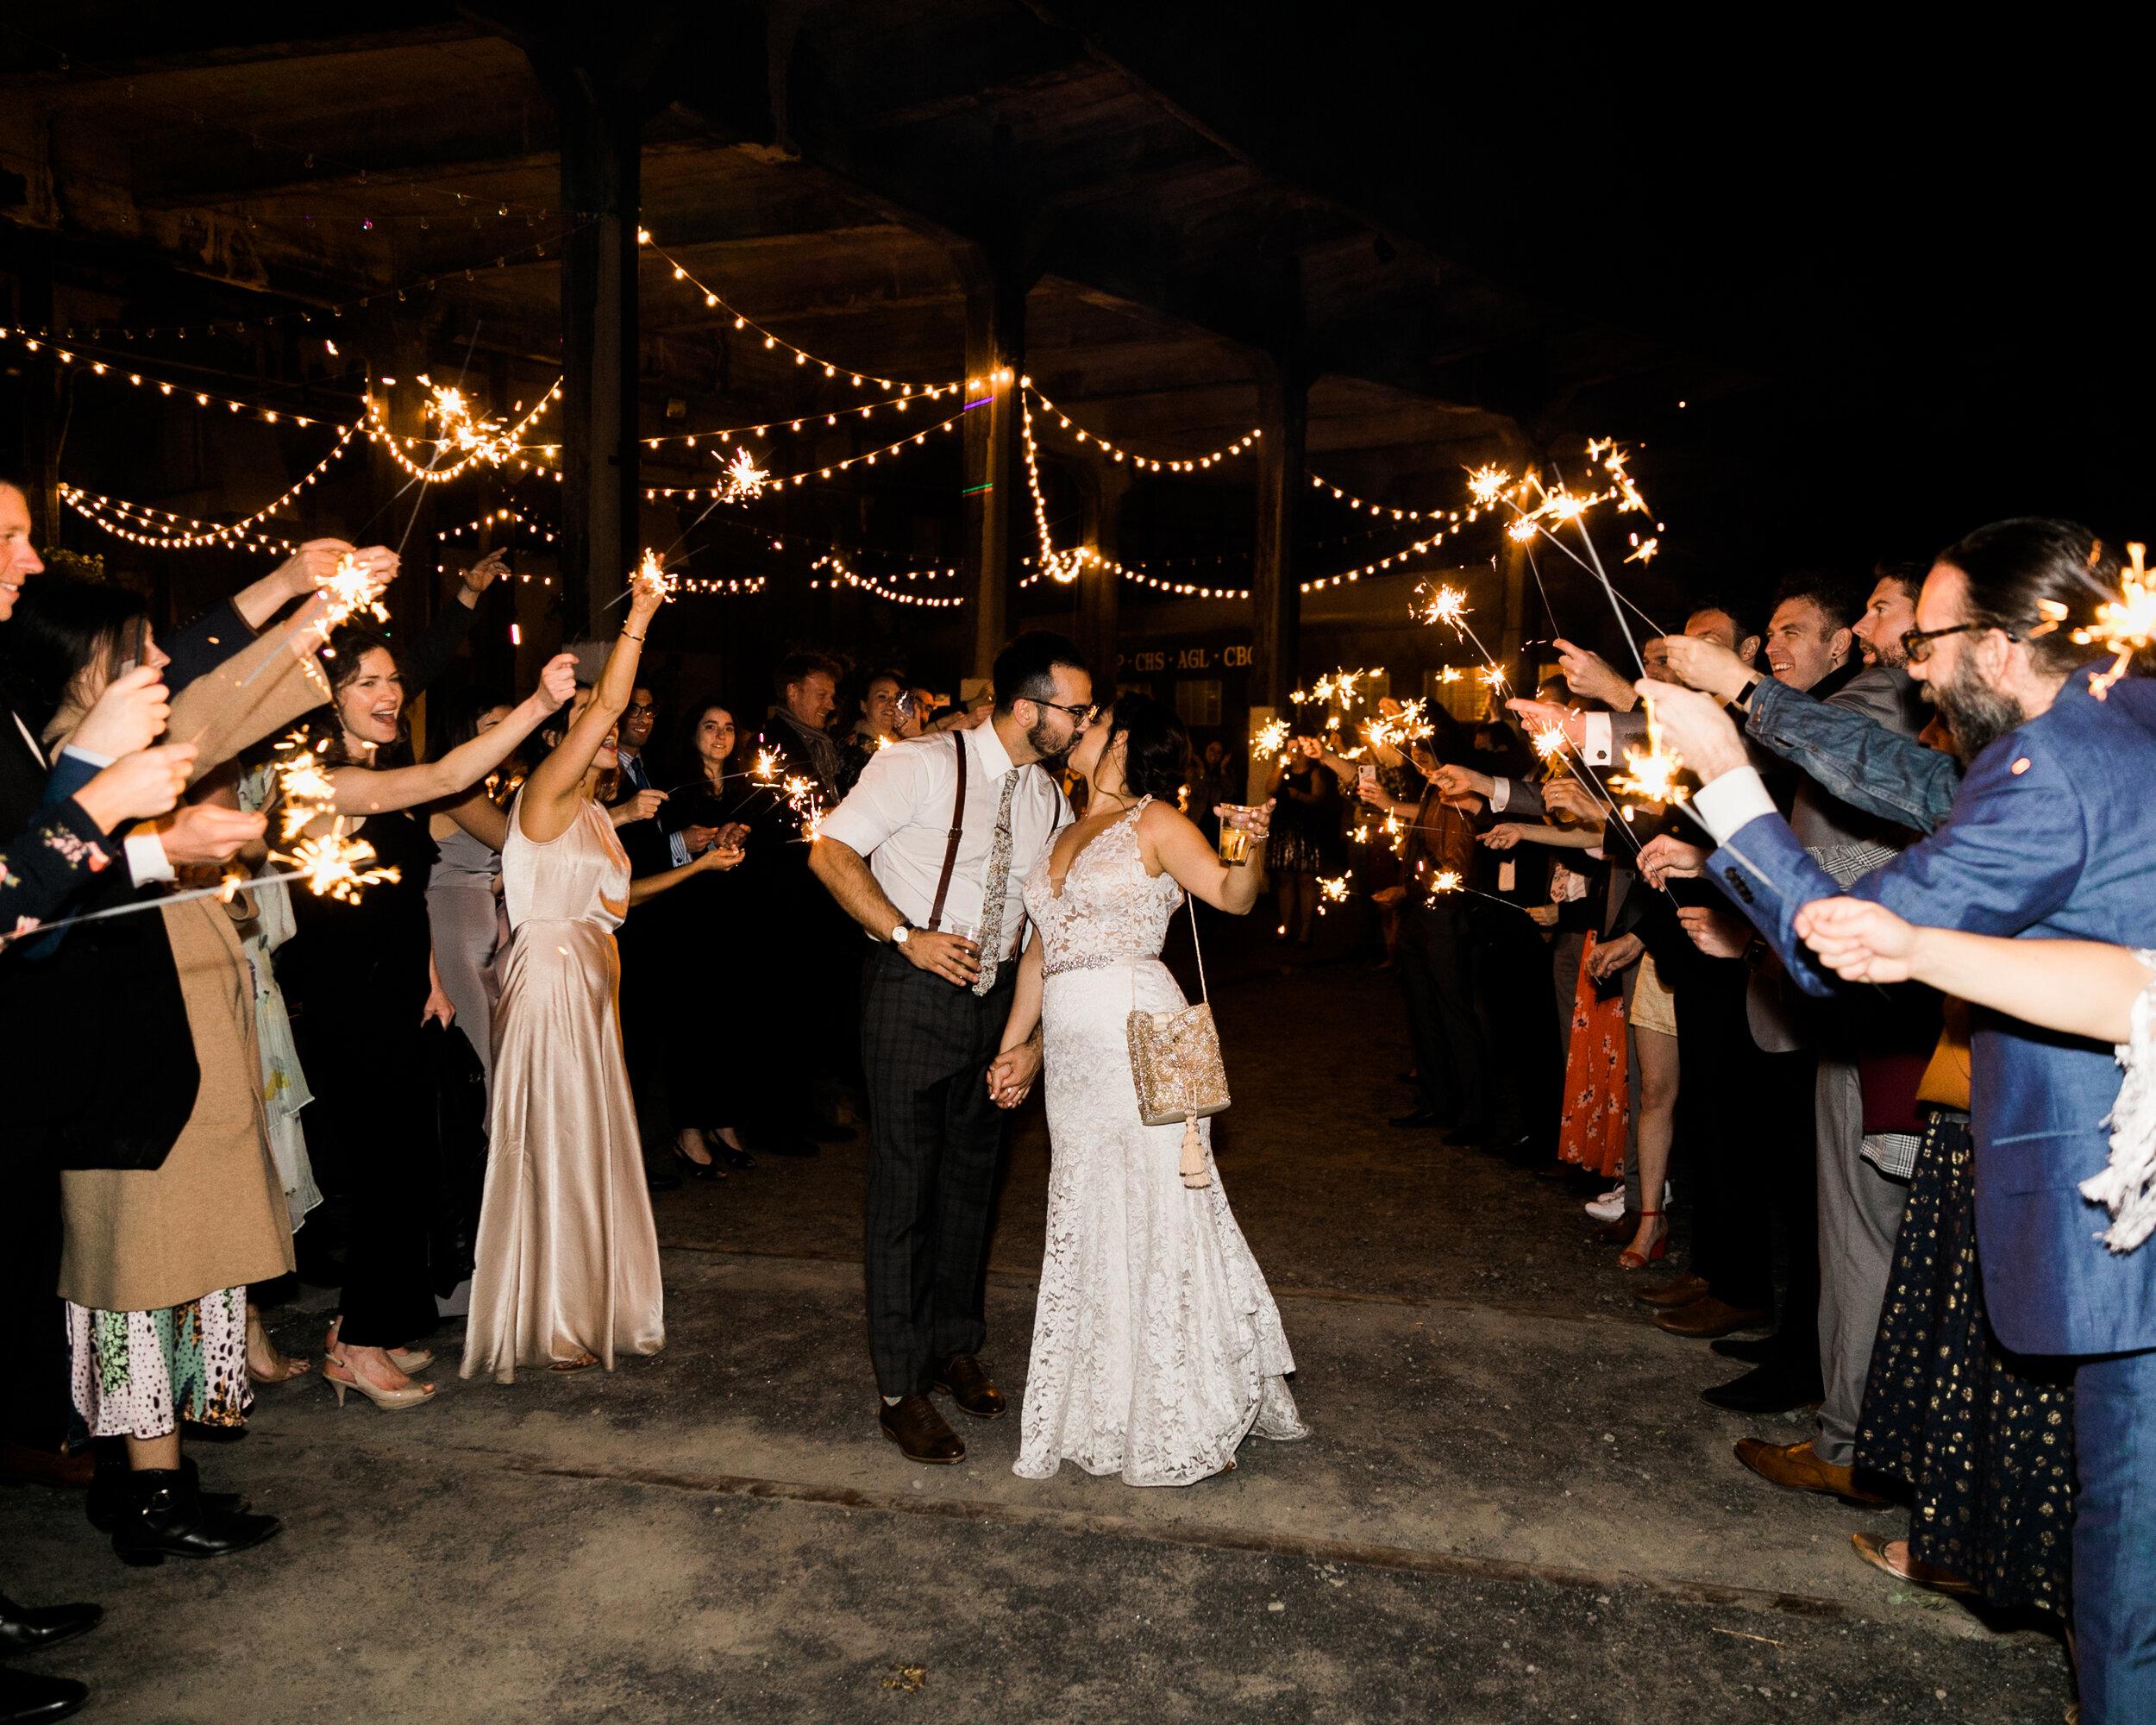 ivory-and-beau-blog-weddings-ivory-and-beau-couple-dominique-and-andres-savannah-florist-wedding-planning-savannah-bridal-boutique-wedding-flowers-KIP_WEBERWEDDING_RAILROADMUSEUM-1879.JPG